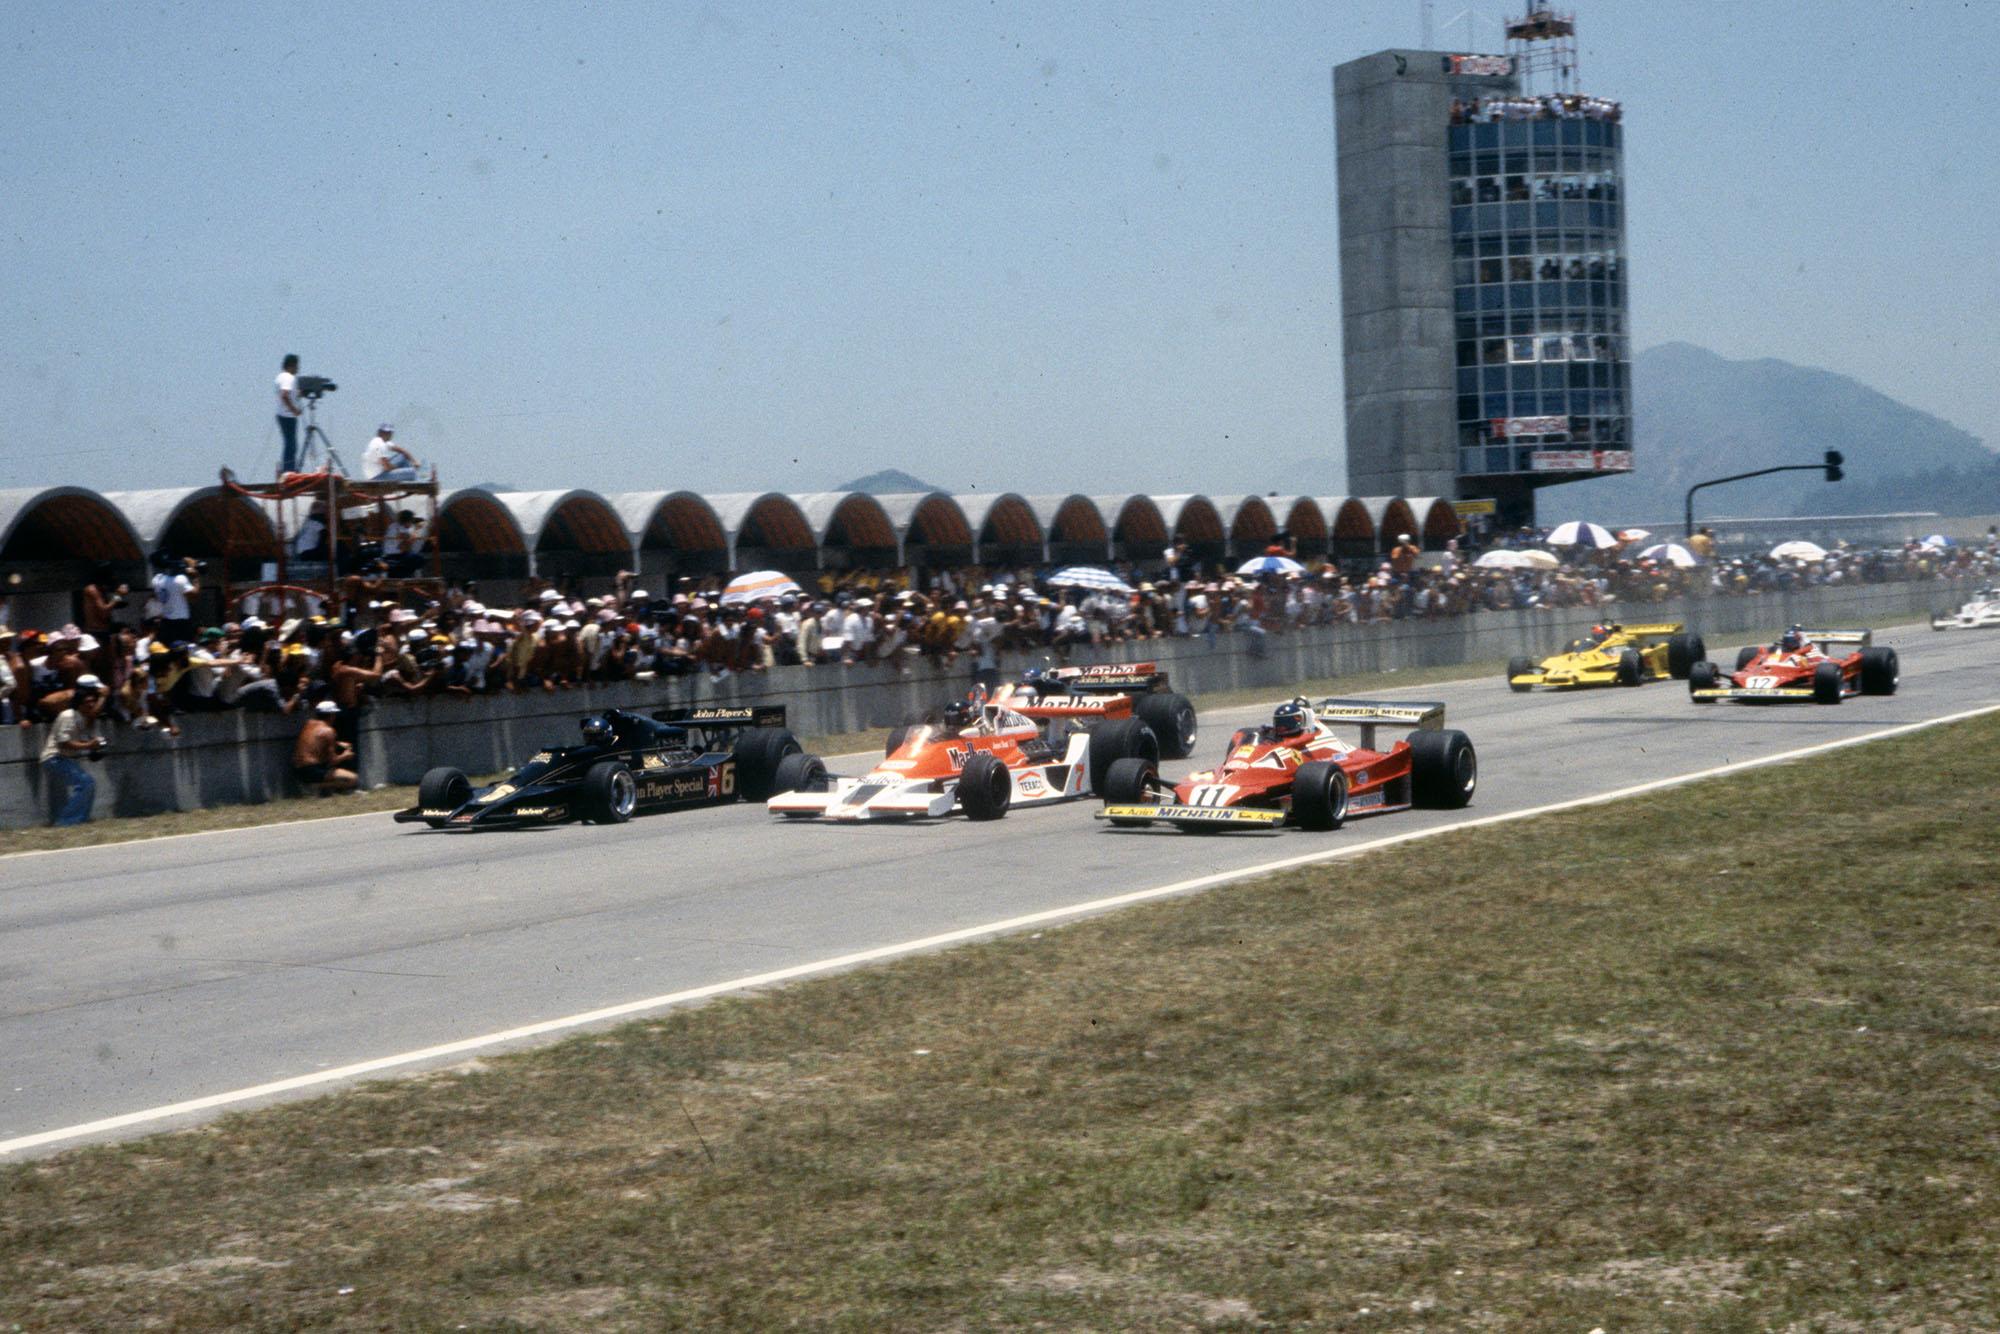 The 1977 Brazilian Grand Prix gets underway, Jacarepagua.